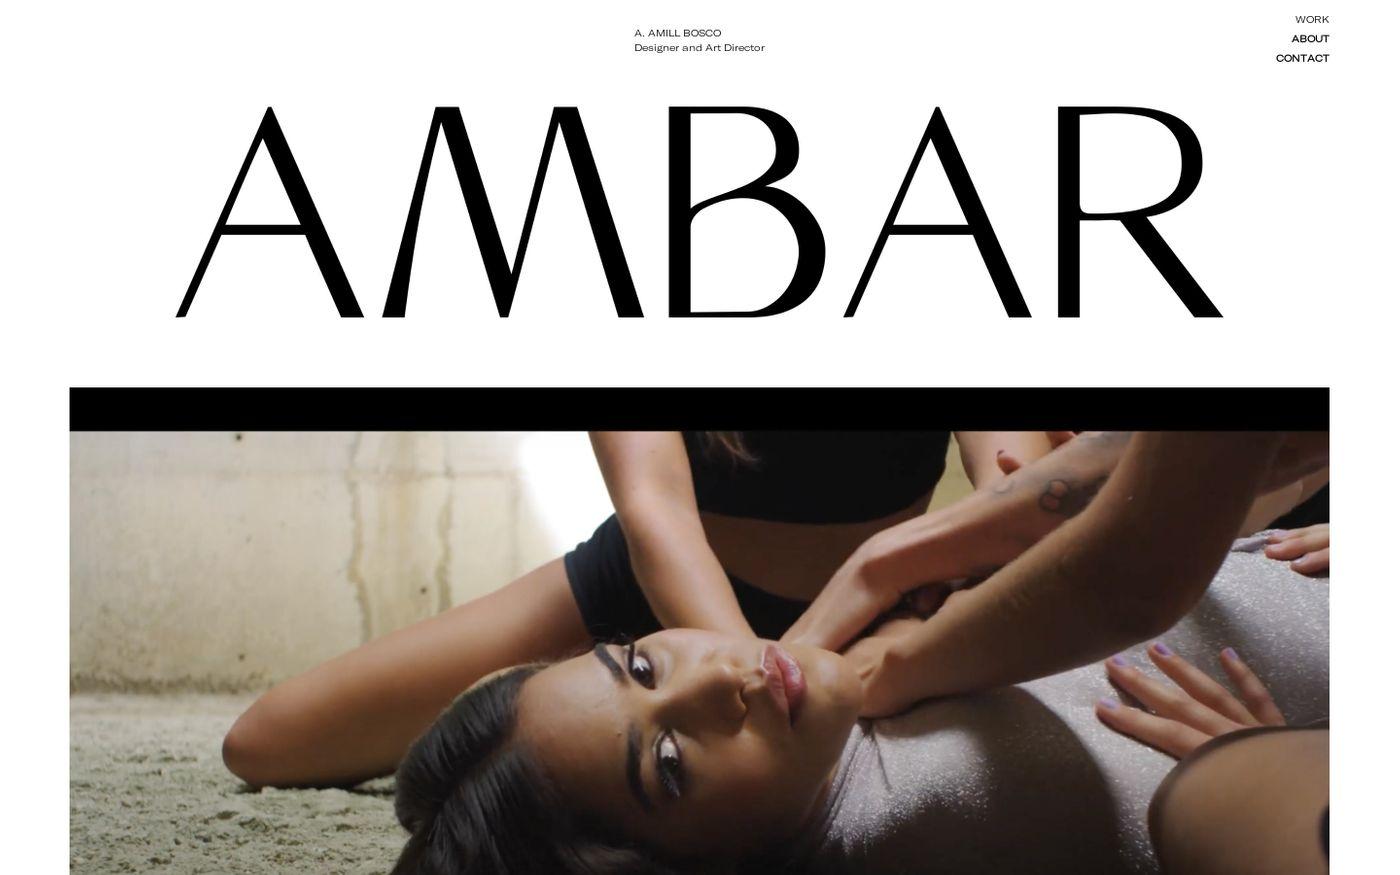 Screenshot of Ambar Amill Bosco website